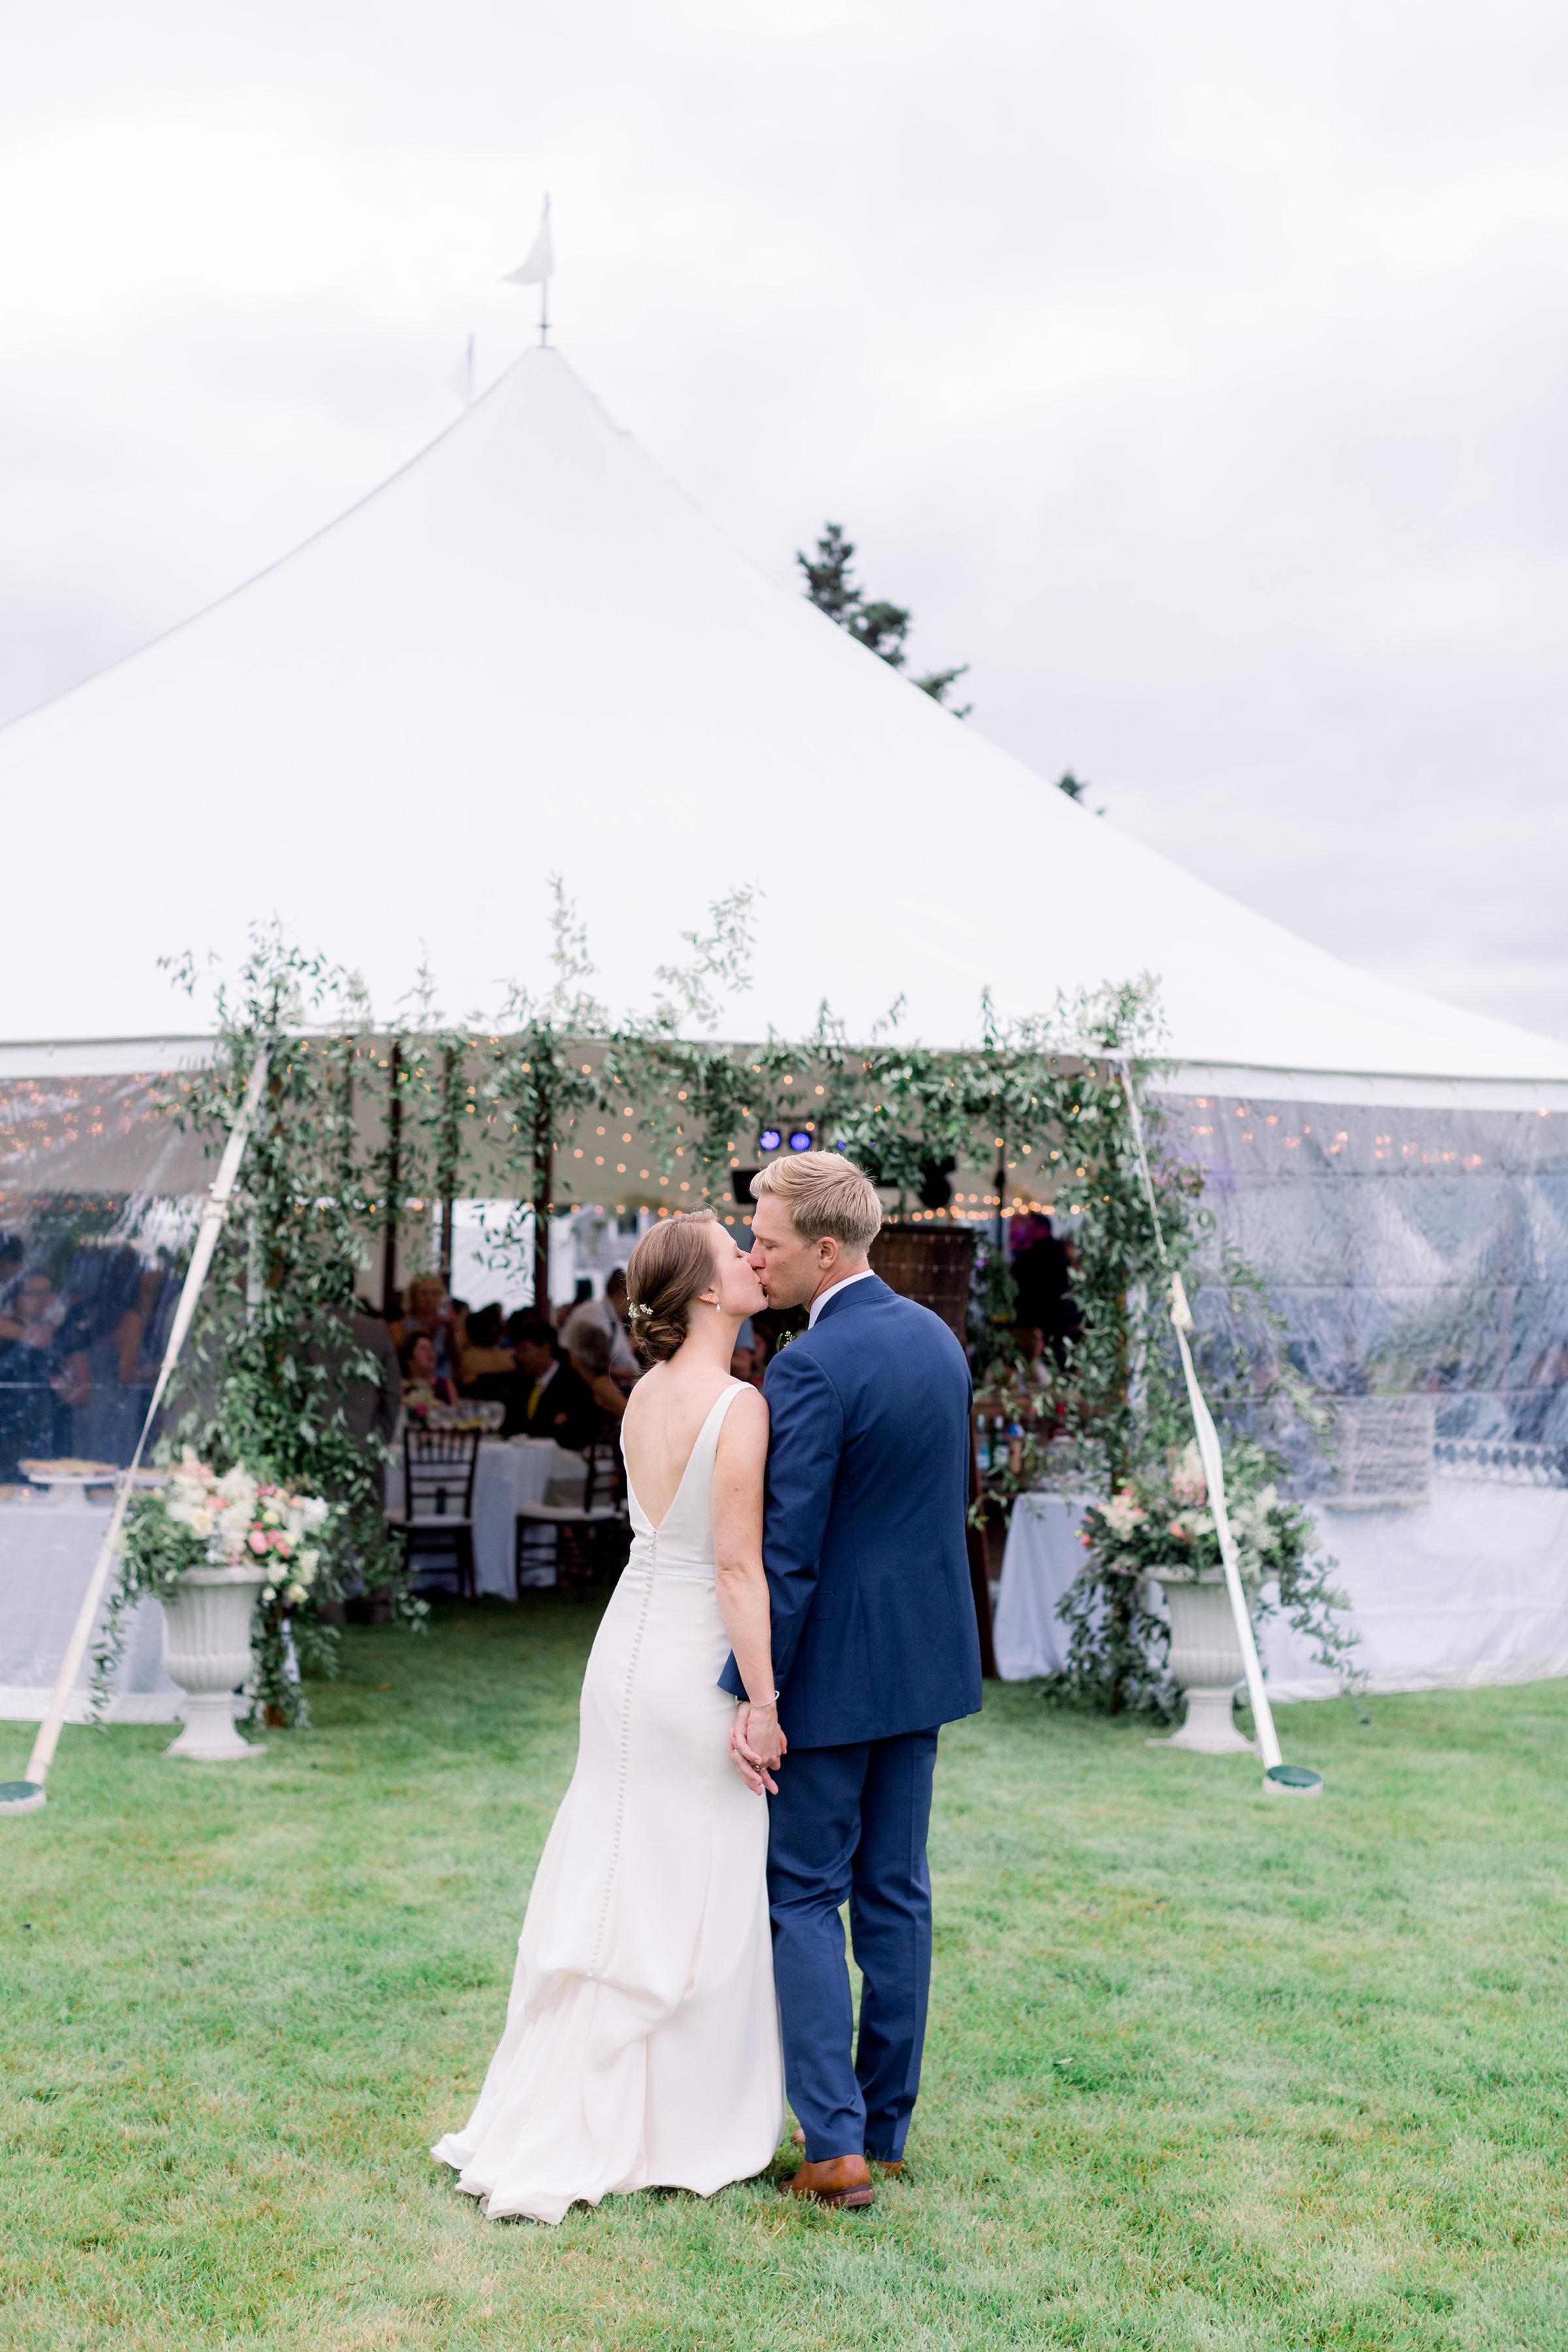 Watershed_Floral_Newagen_Wedding_Maine_6466.jpg